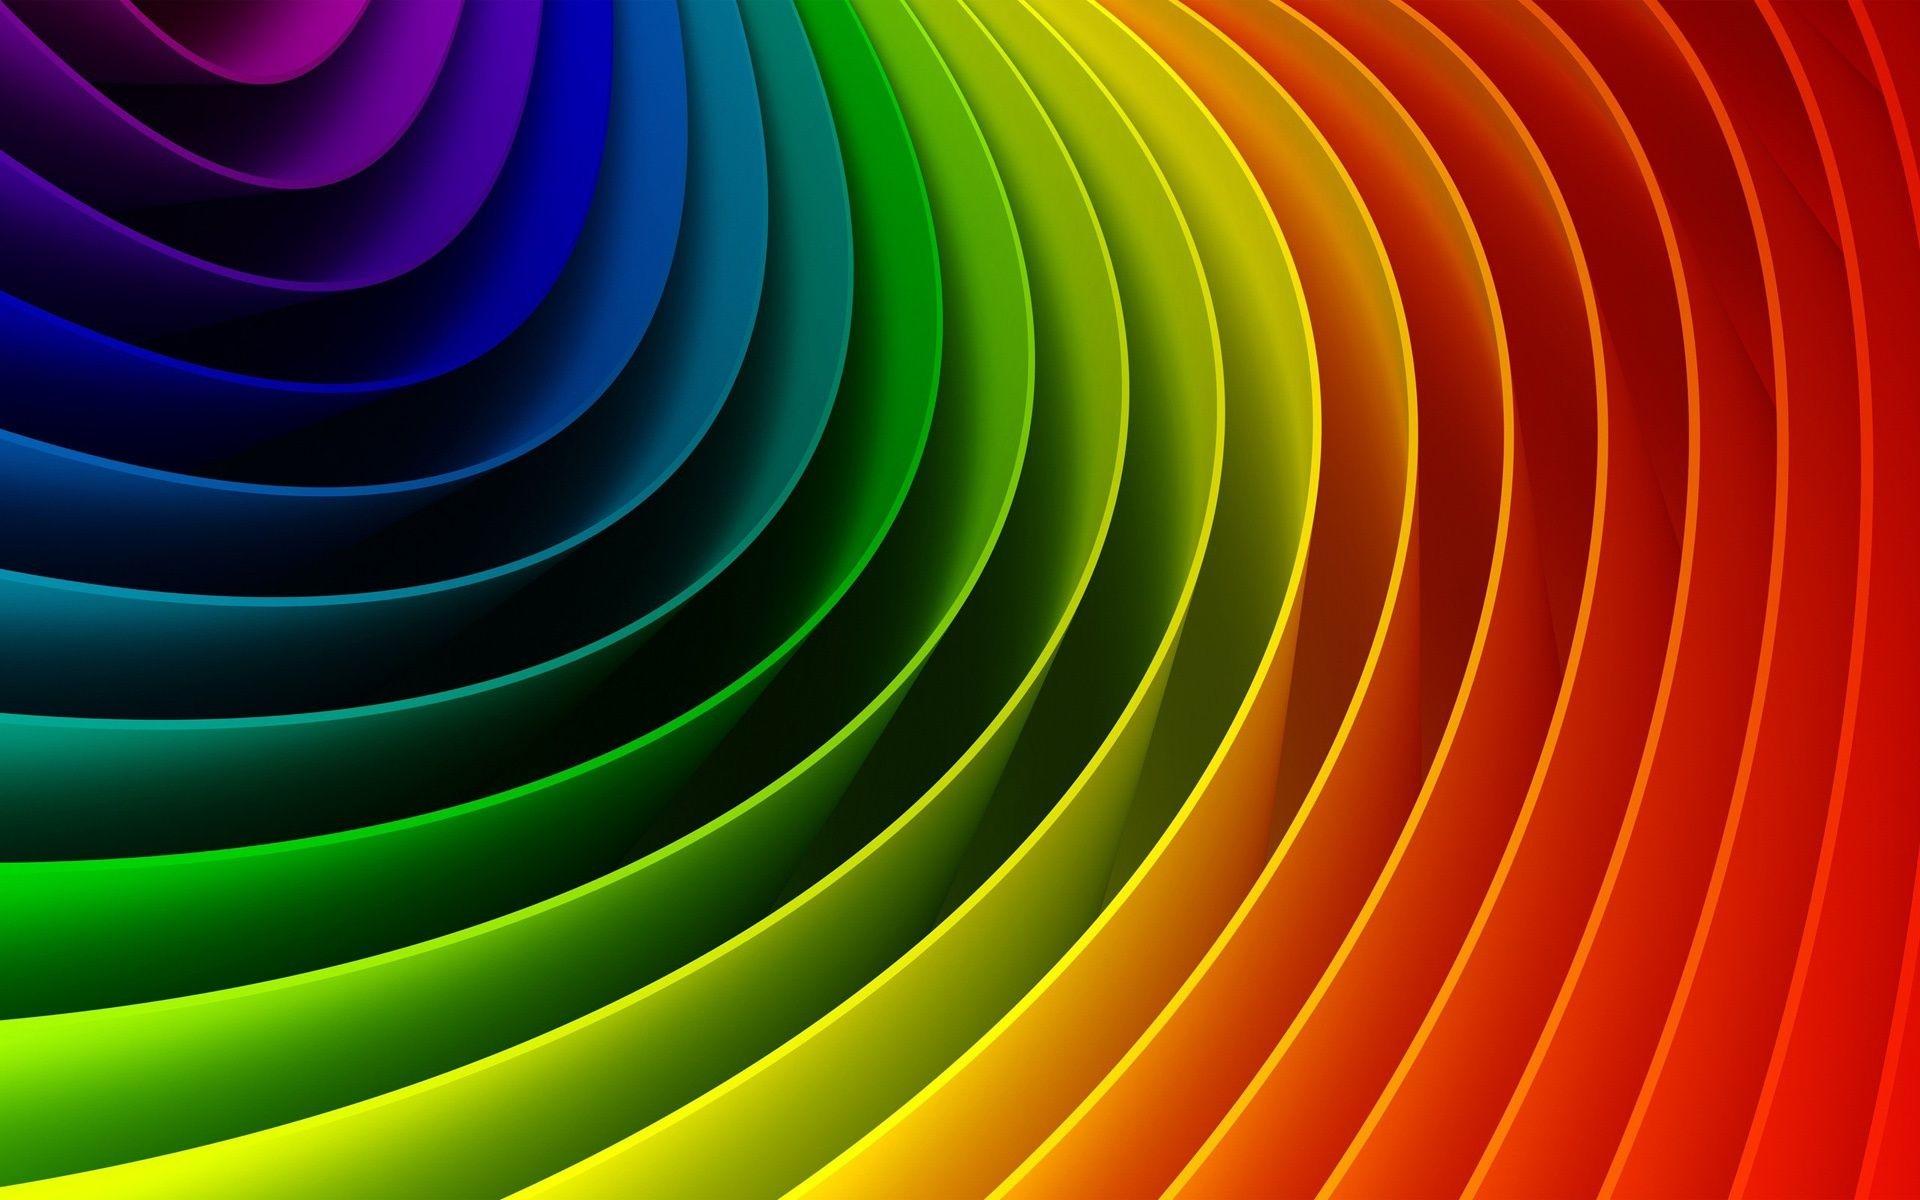 Colors Of The Rainbow. rainbow colors minimal desktop wallpaper